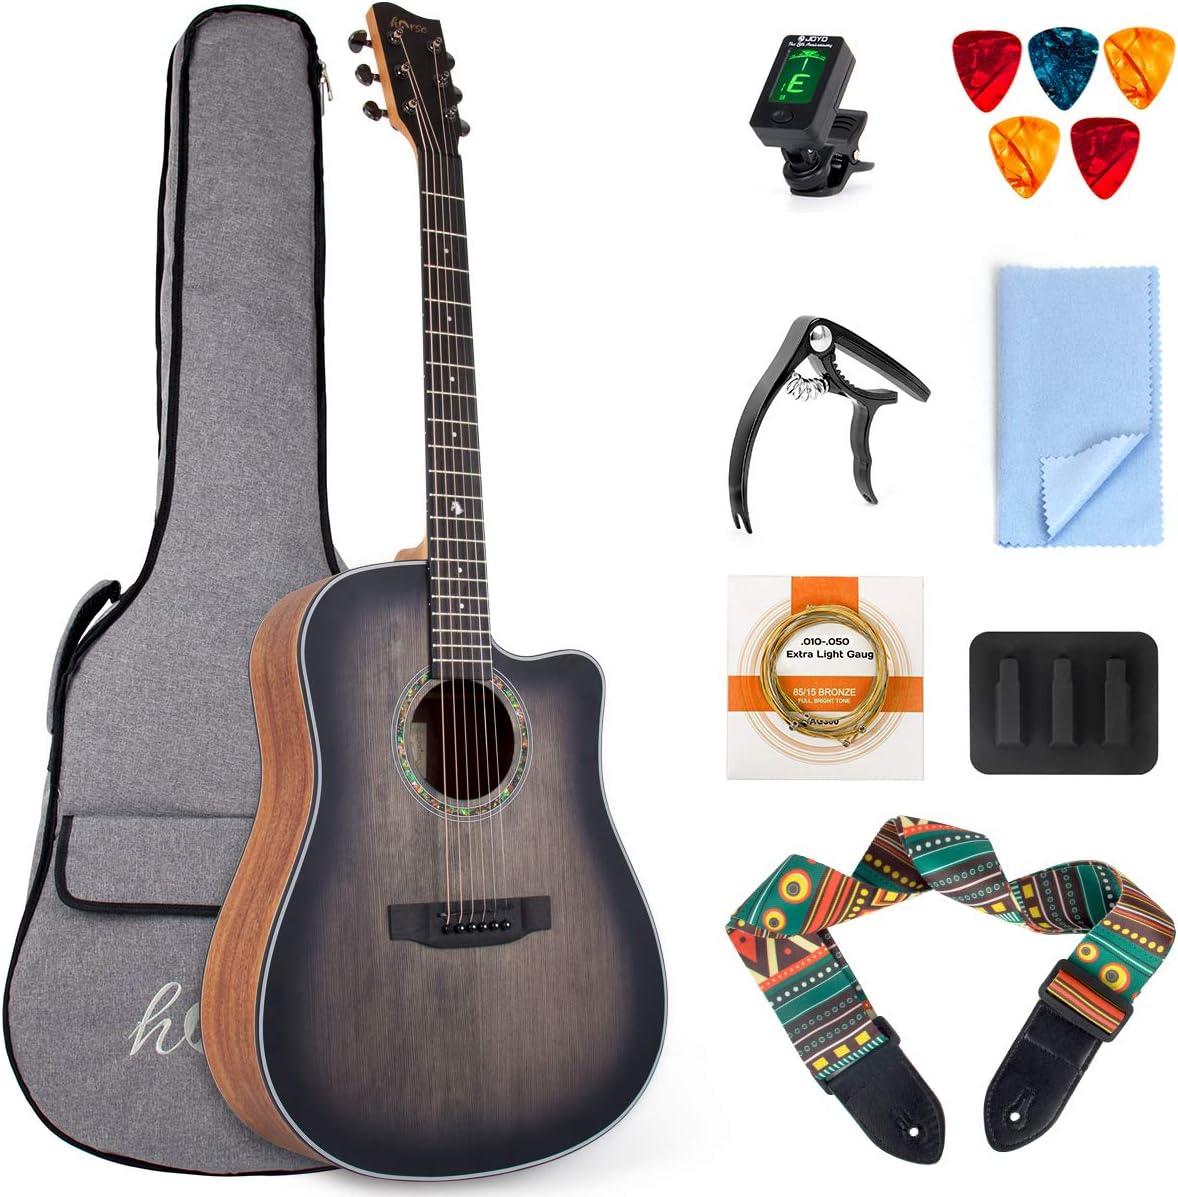 Lotmusic Dreadnought Acoustic Guitar